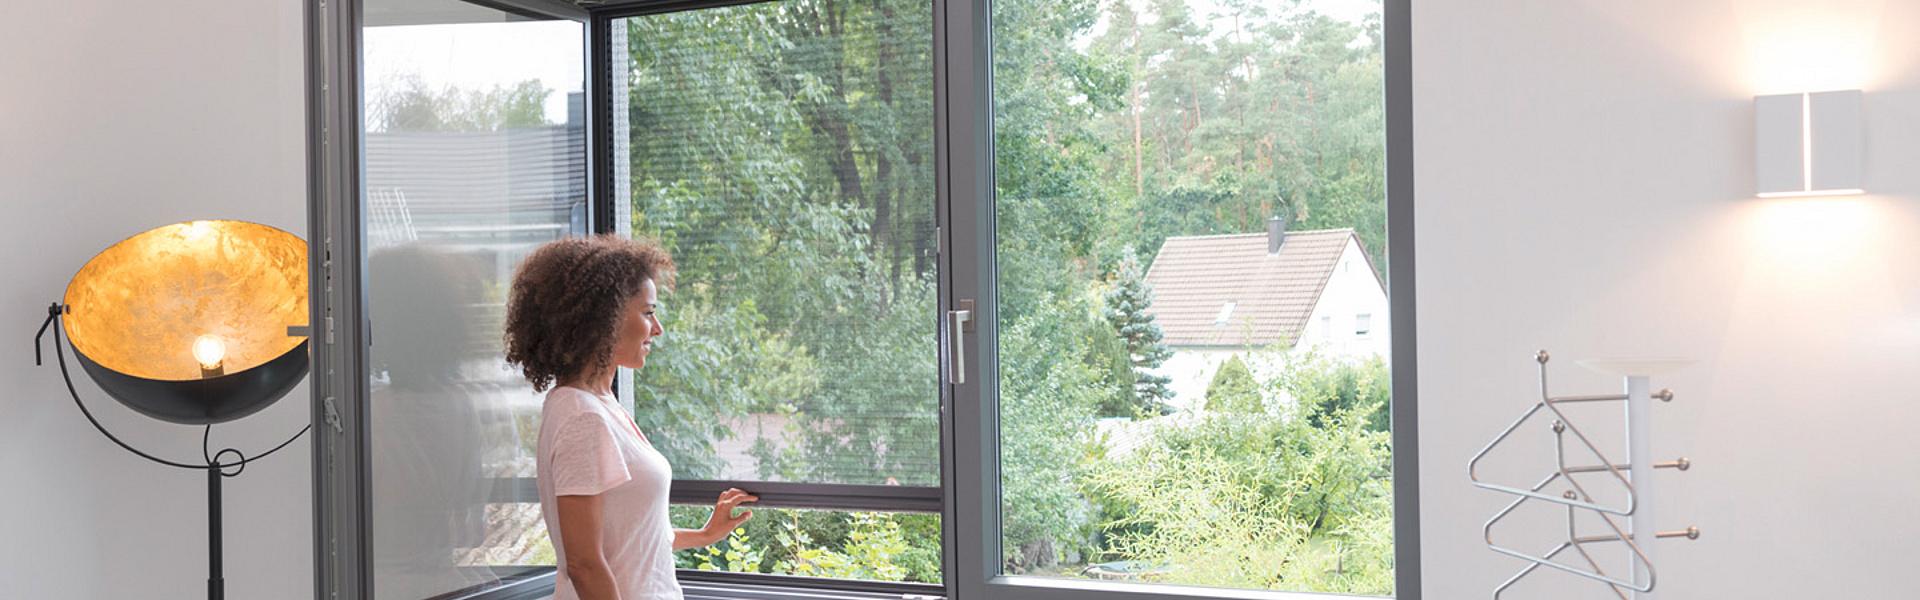 plissee f r fenster flexibler insektenschutz l mmermann. Black Bedroom Furniture Sets. Home Design Ideas